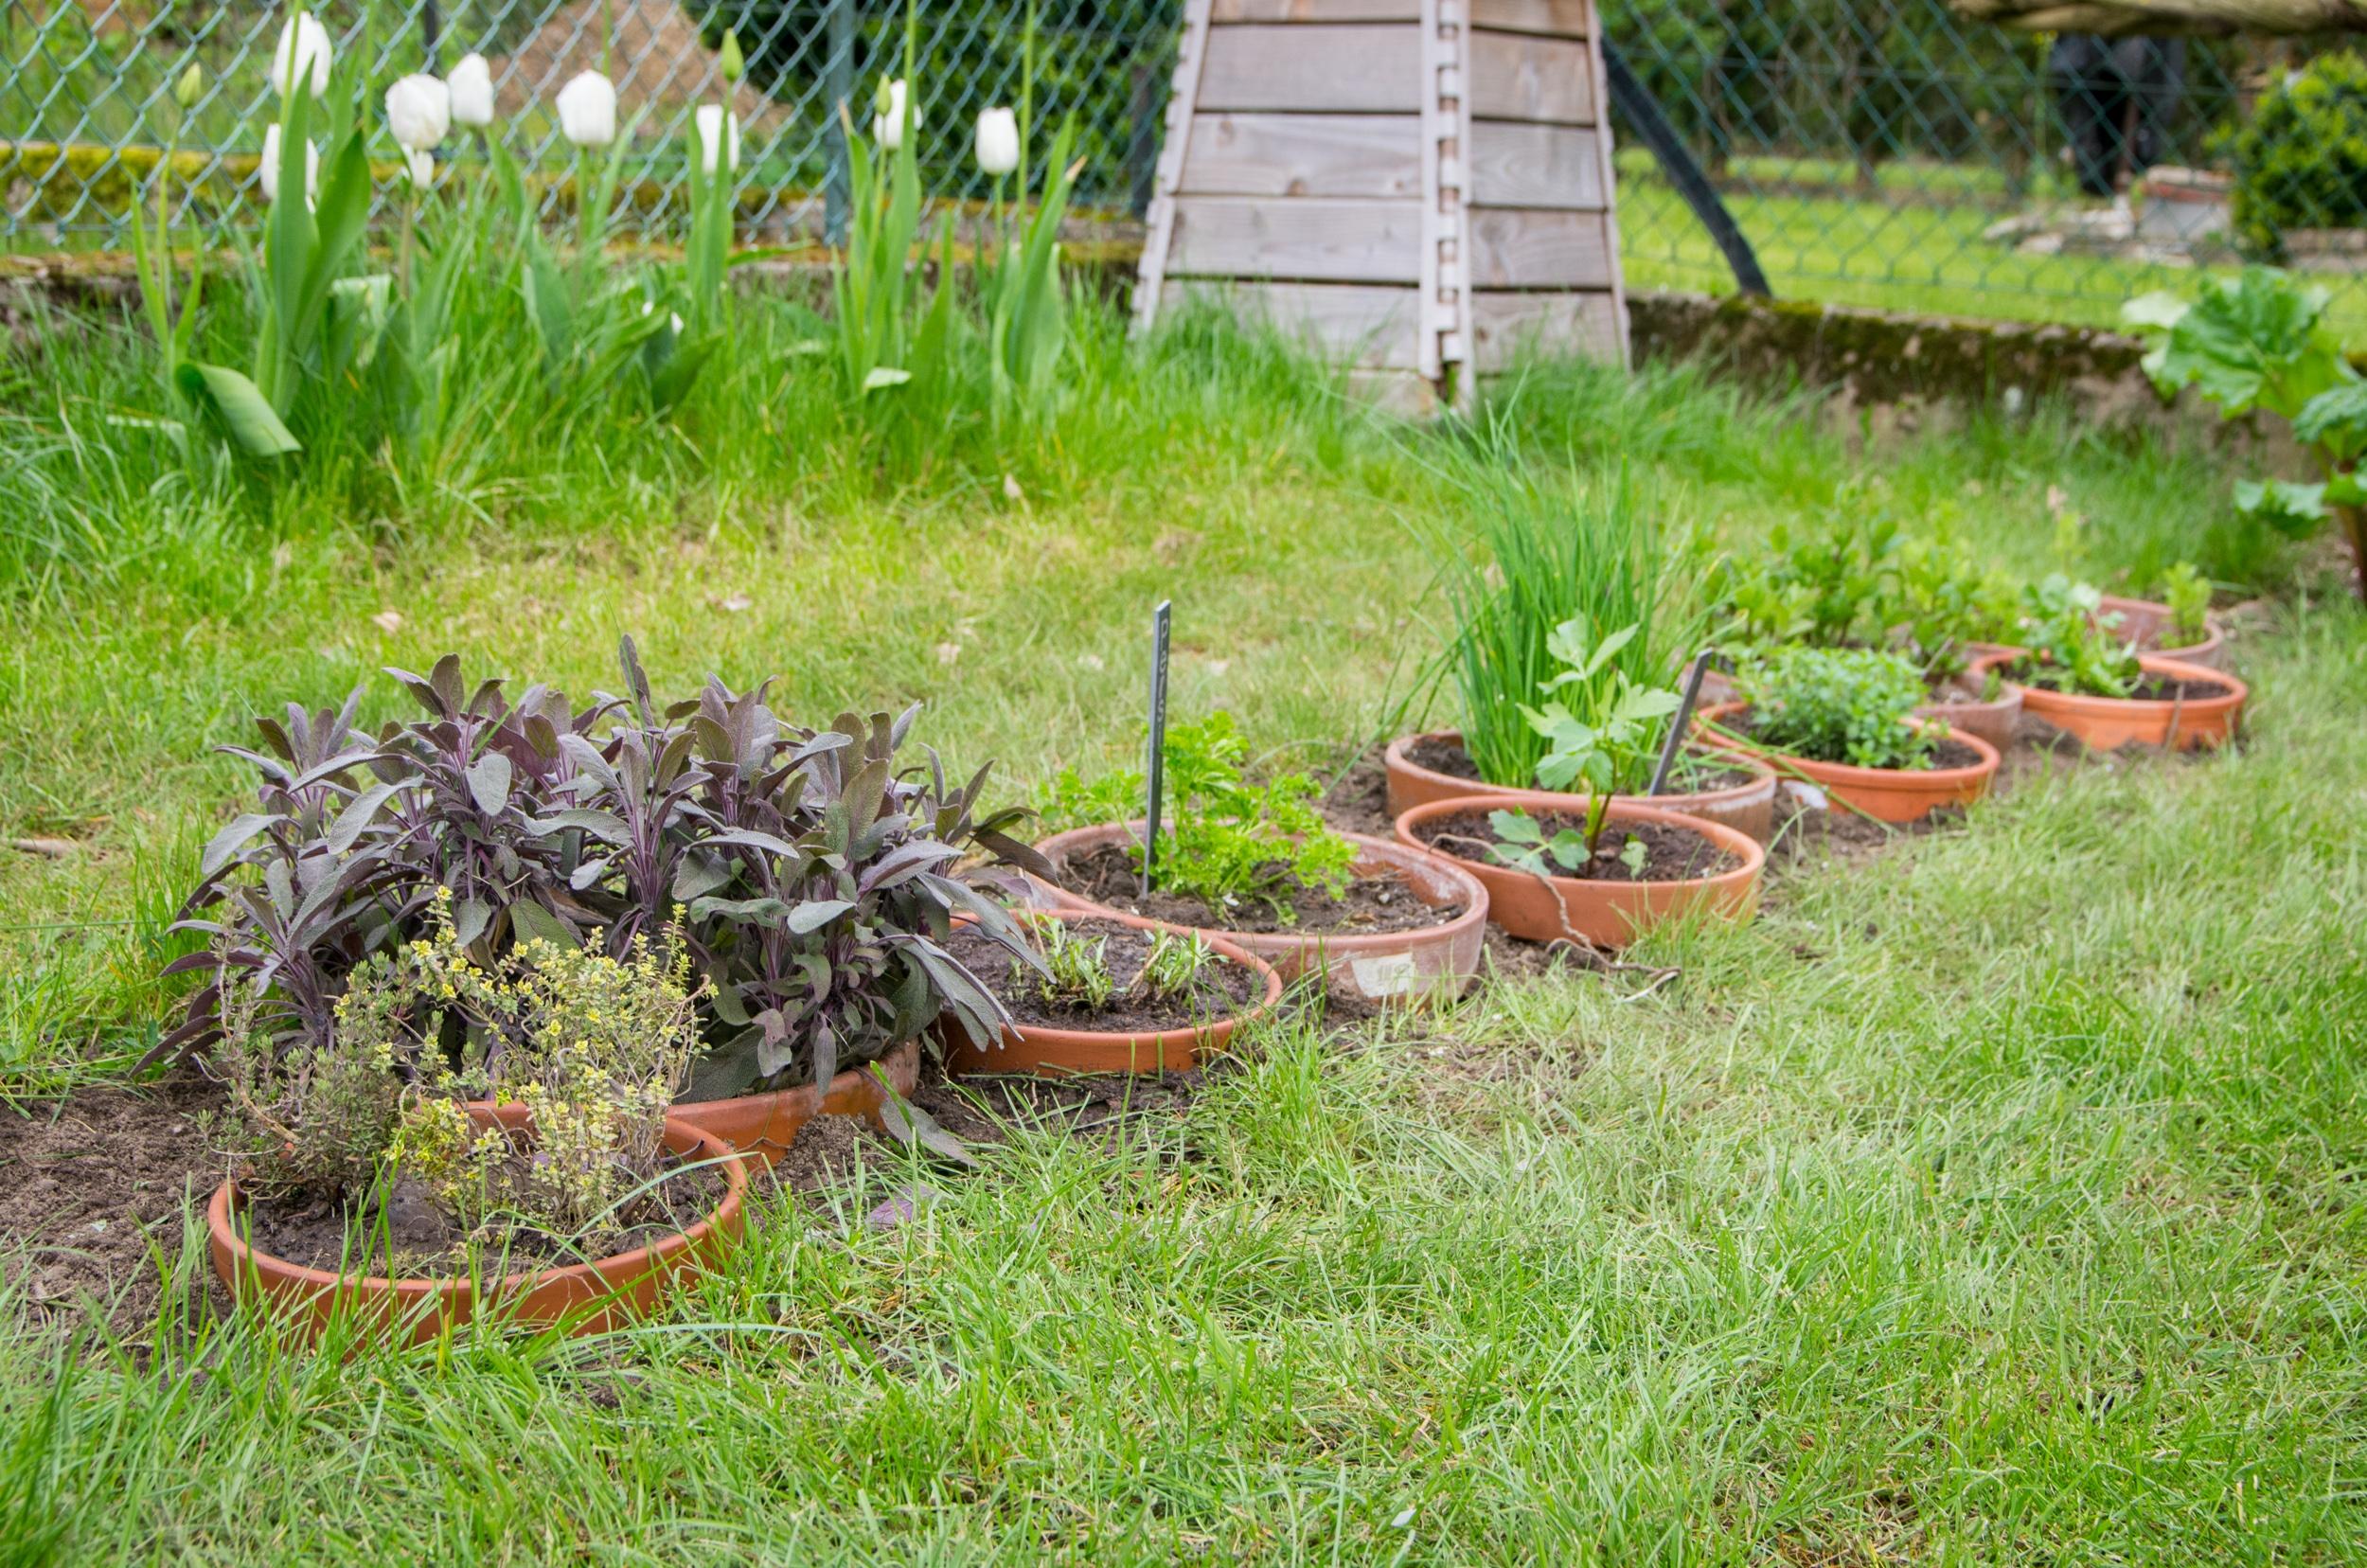 cr er une bordure d 39 herbes aromatiques en pots. Black Bedroom Furniture Sets. Home Design Ideas